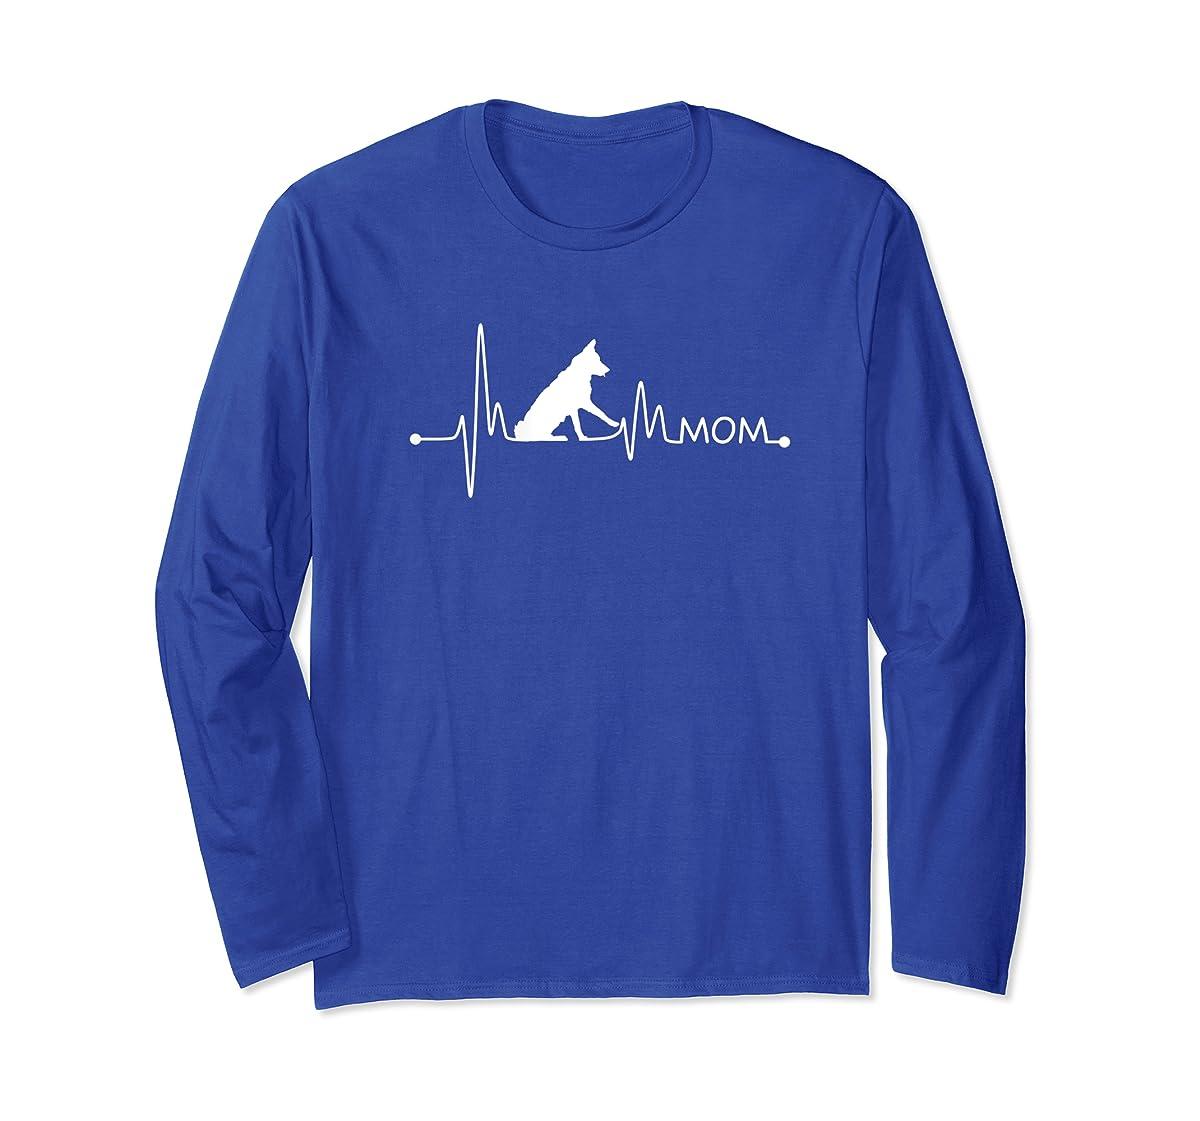 Womens Border Collie Heartbeat Mom Shirt Ekg Pulse Collie Lover Tee-Long Sleeve-Royal